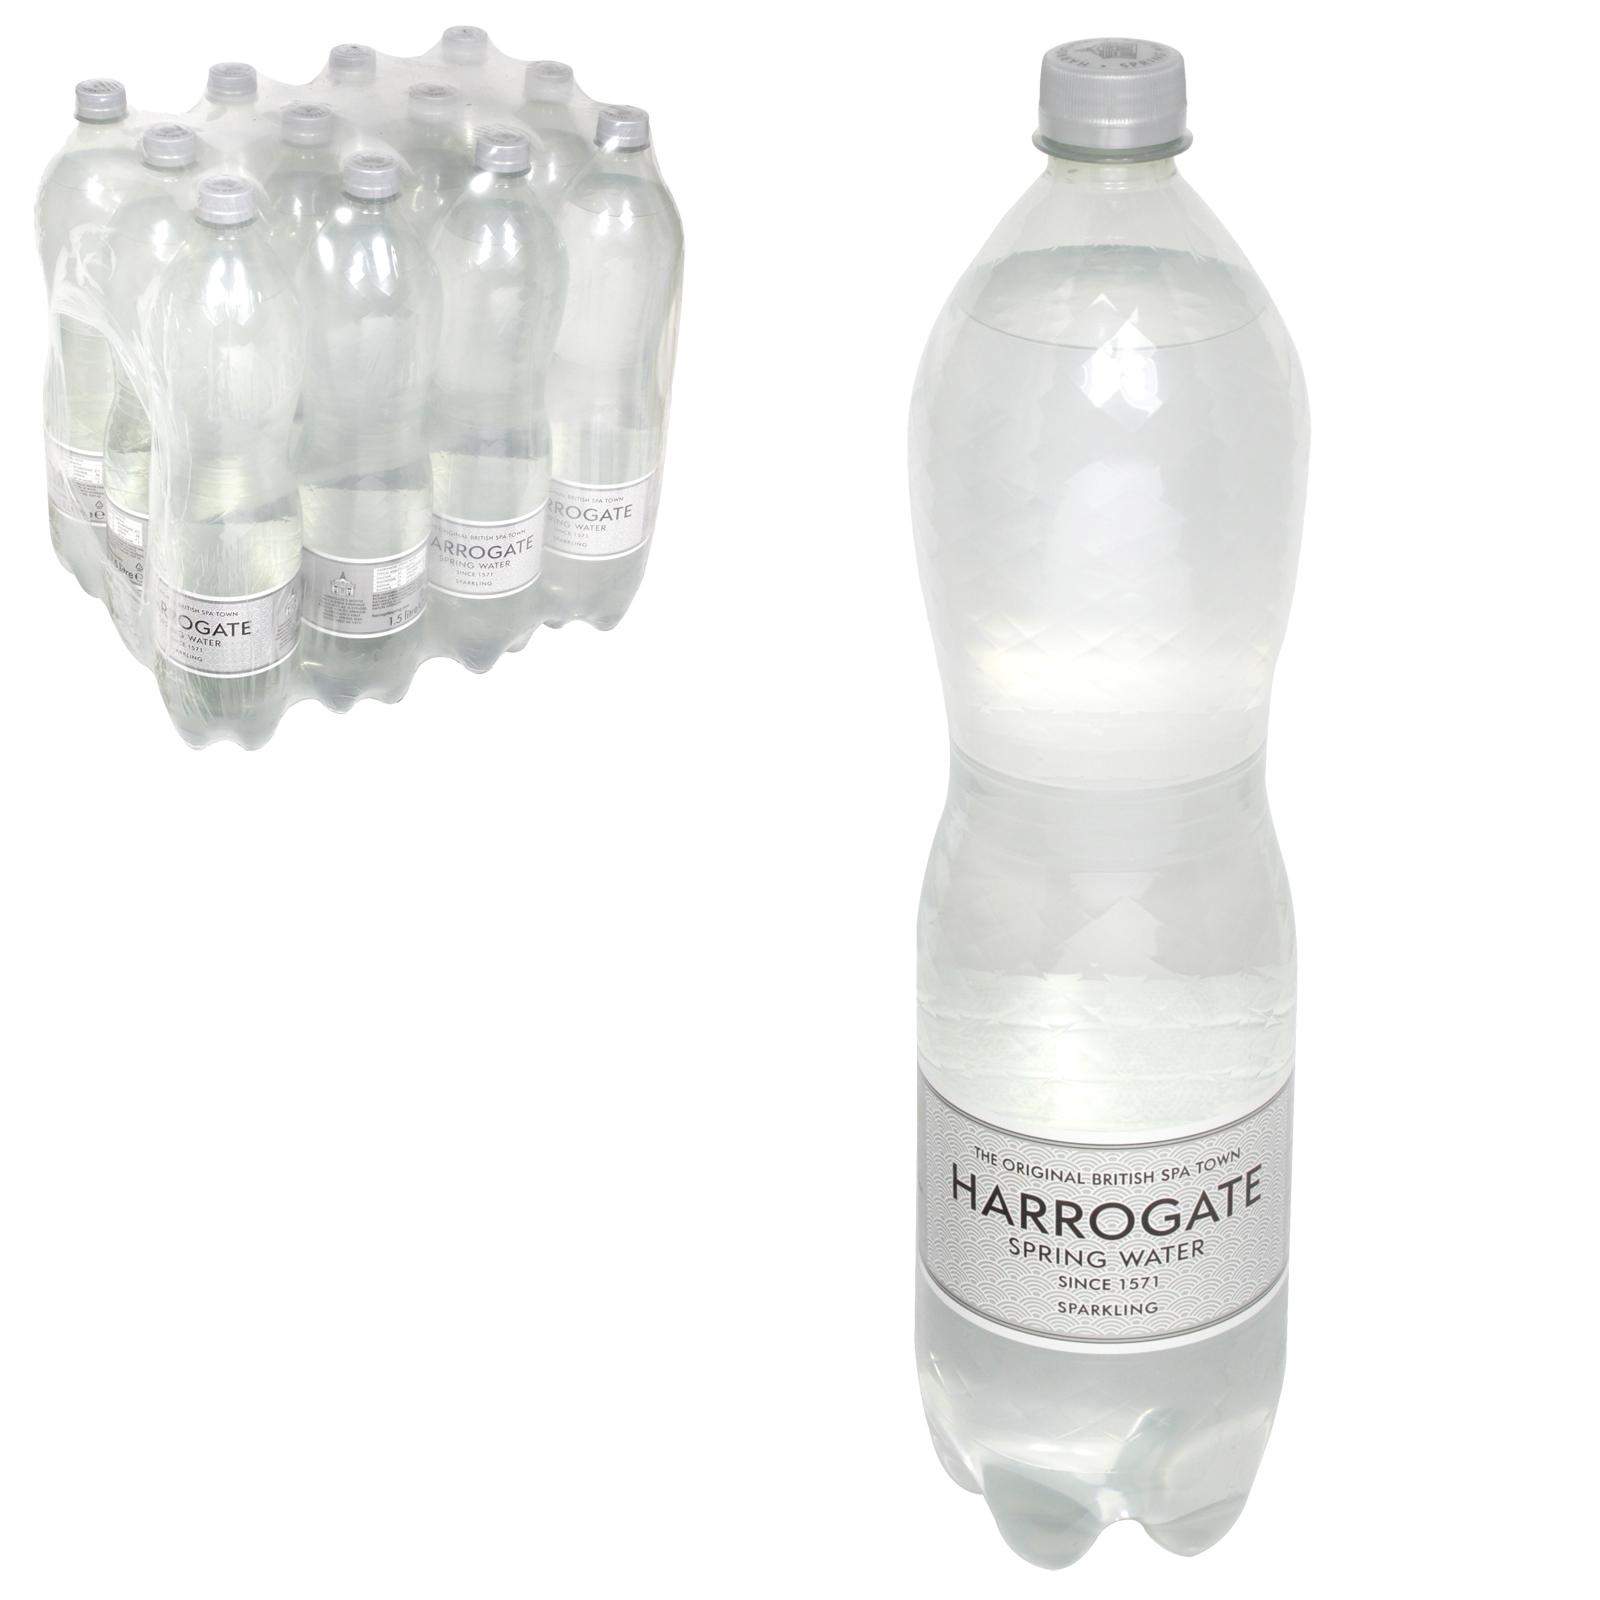 HARROGATE SPARKLING WATER 1.5L X12